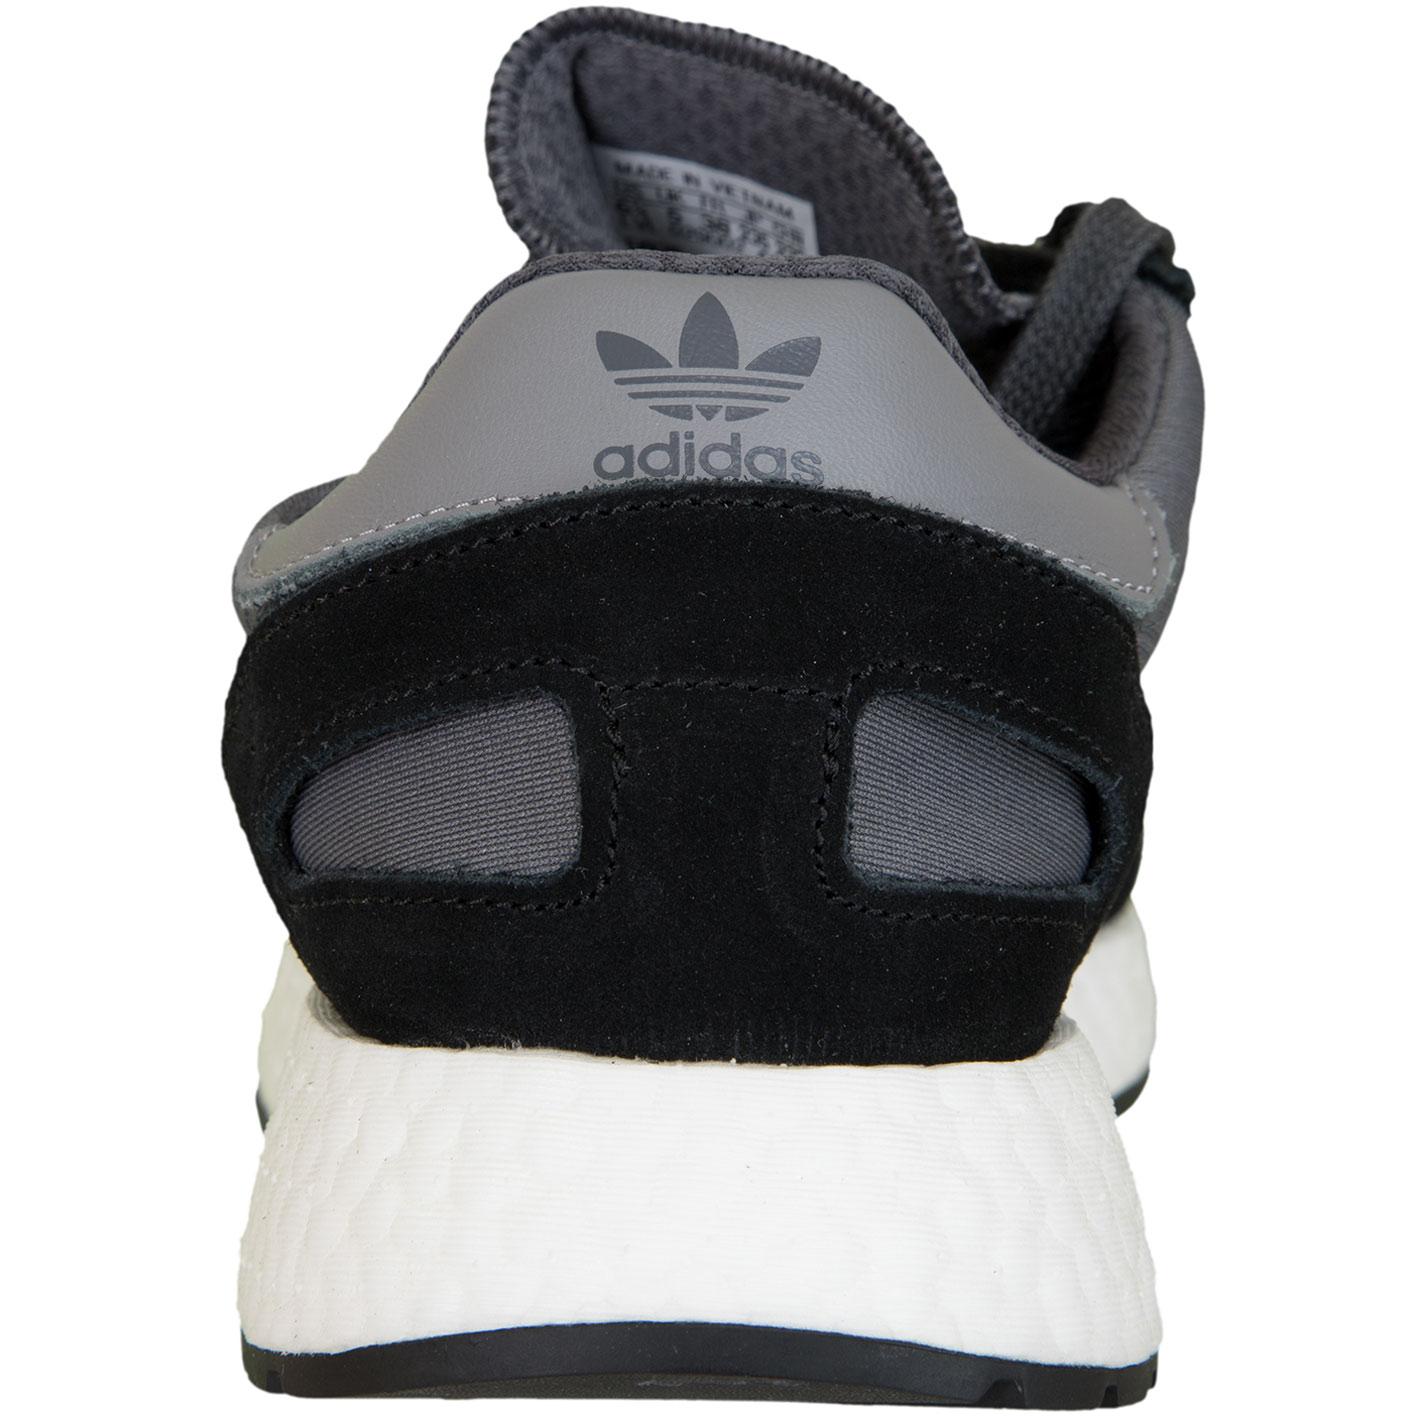 Adidas Originals Damen Sneaker I 5923 schwarzgrau